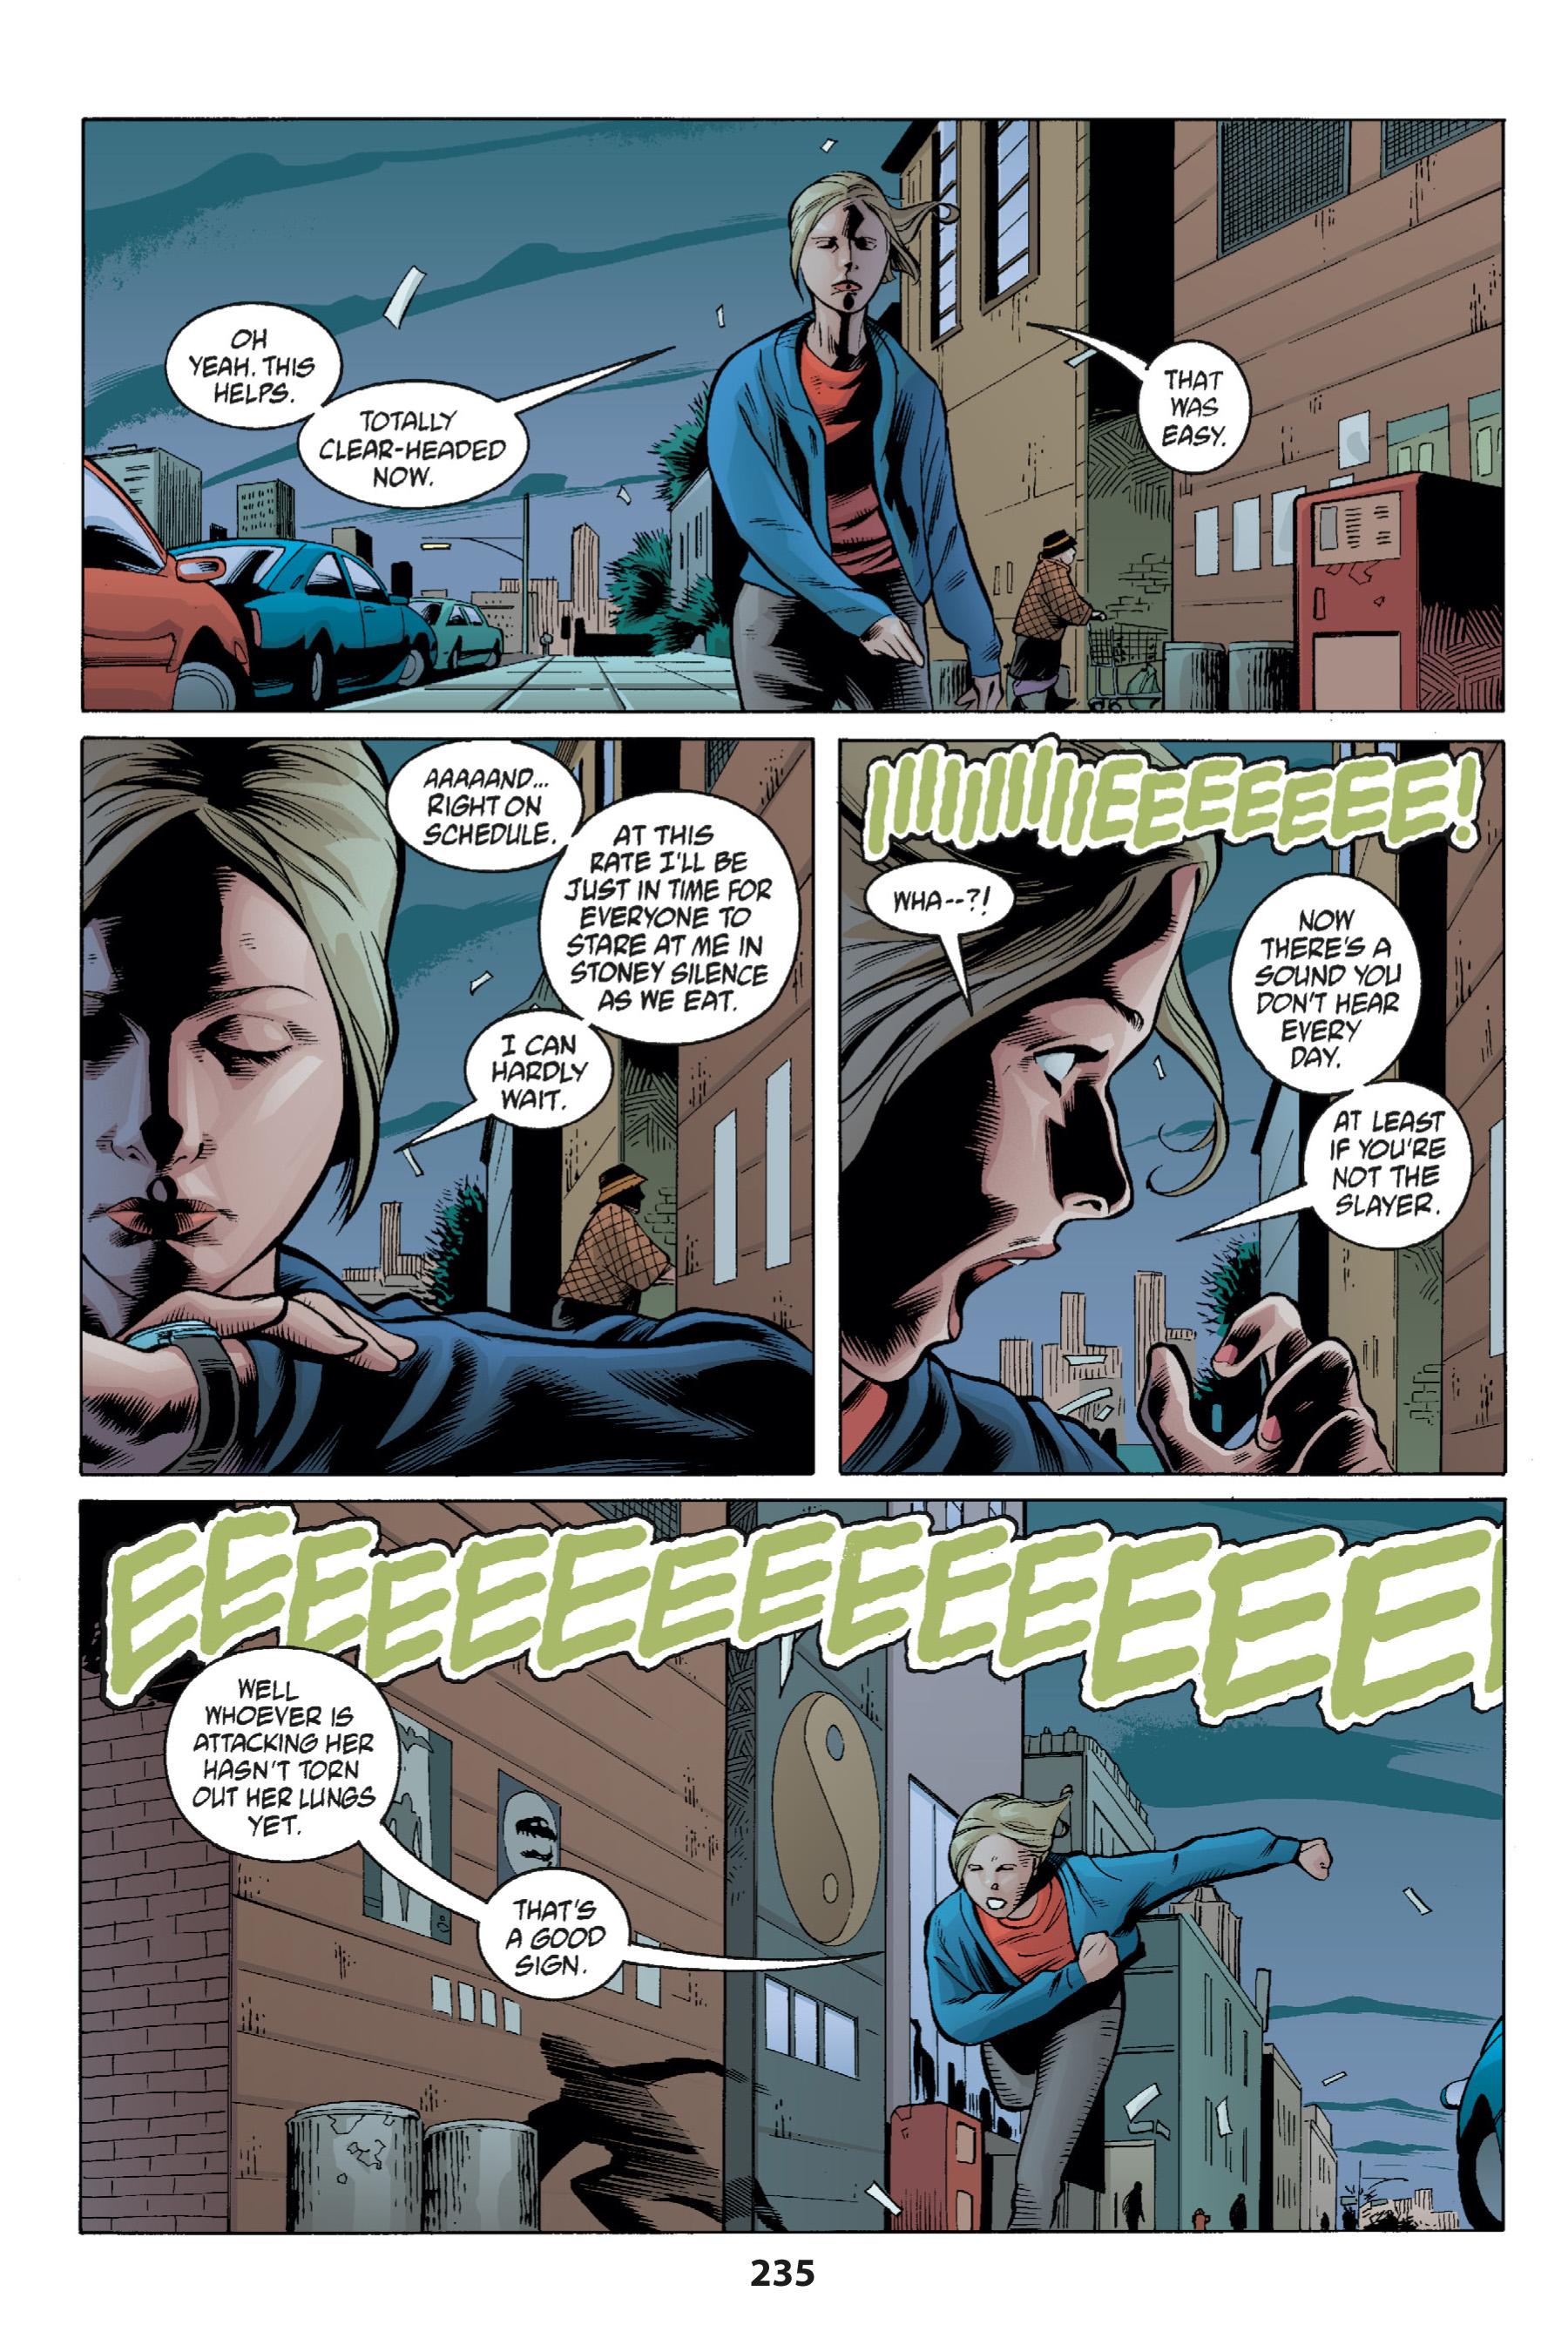 Read online Buffy the Vampire Slayer: Omnibus comic -  Issue # TPB 1 - 230